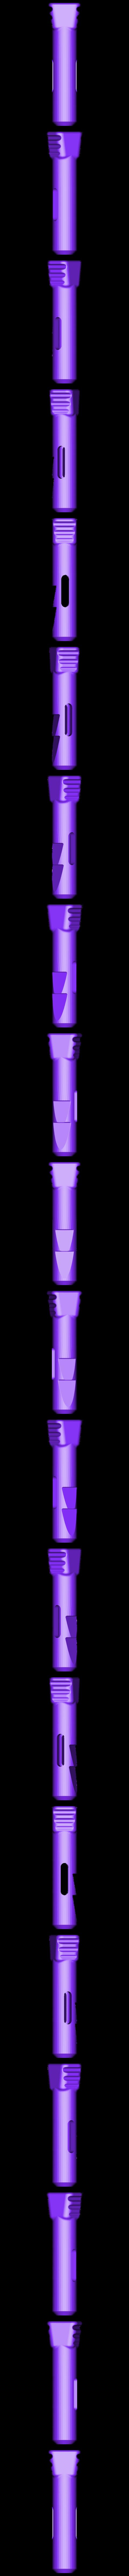 DEER_GUN_V4_STRIKER.stl Download free STL file The Deer Gun (Historical Prop) • Object to 3D print, MuSSy